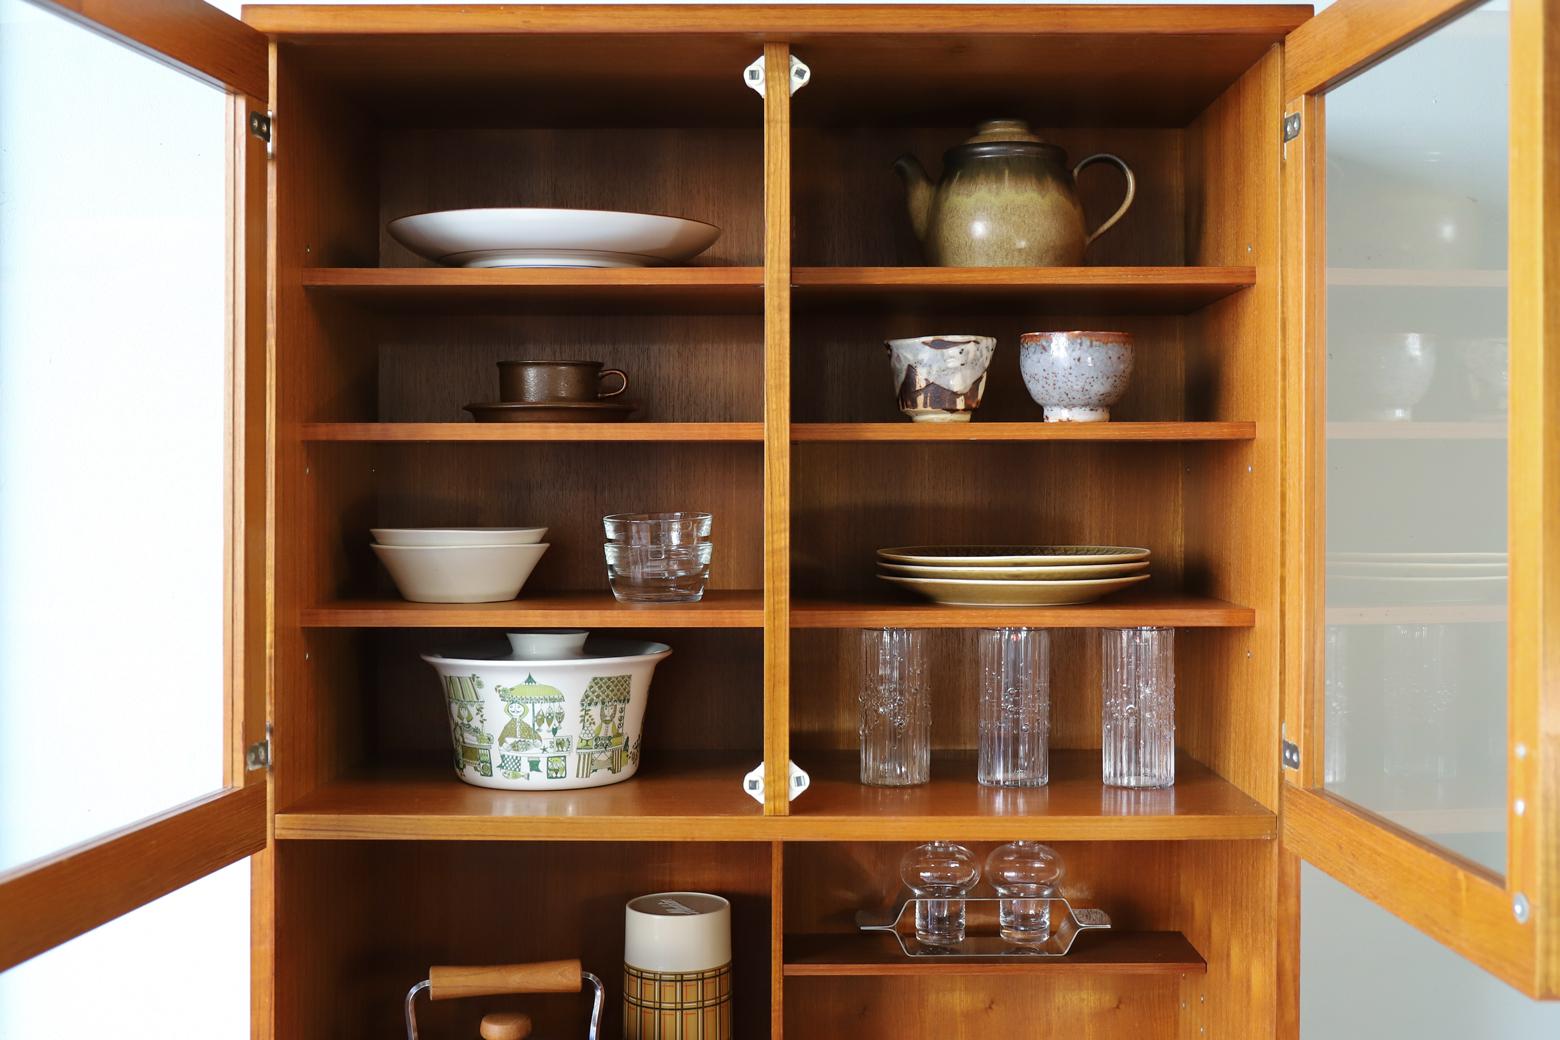 Japan Vintage Cupboard Teakwood/ジャパンヴィンテージ カップボード 食器棚 チーク材 収納家具